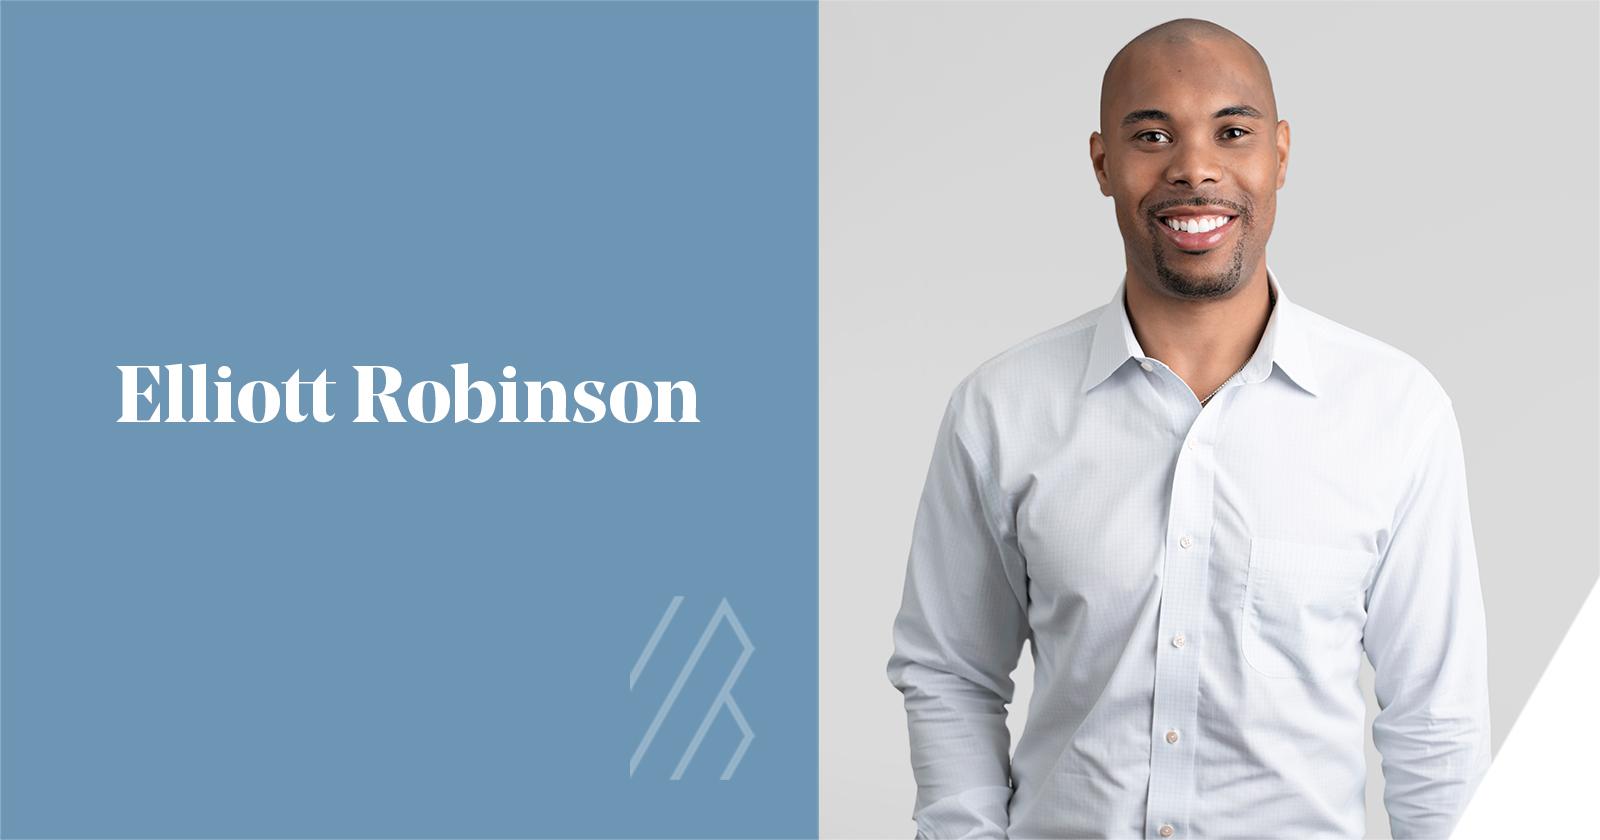 Elliott Robinson